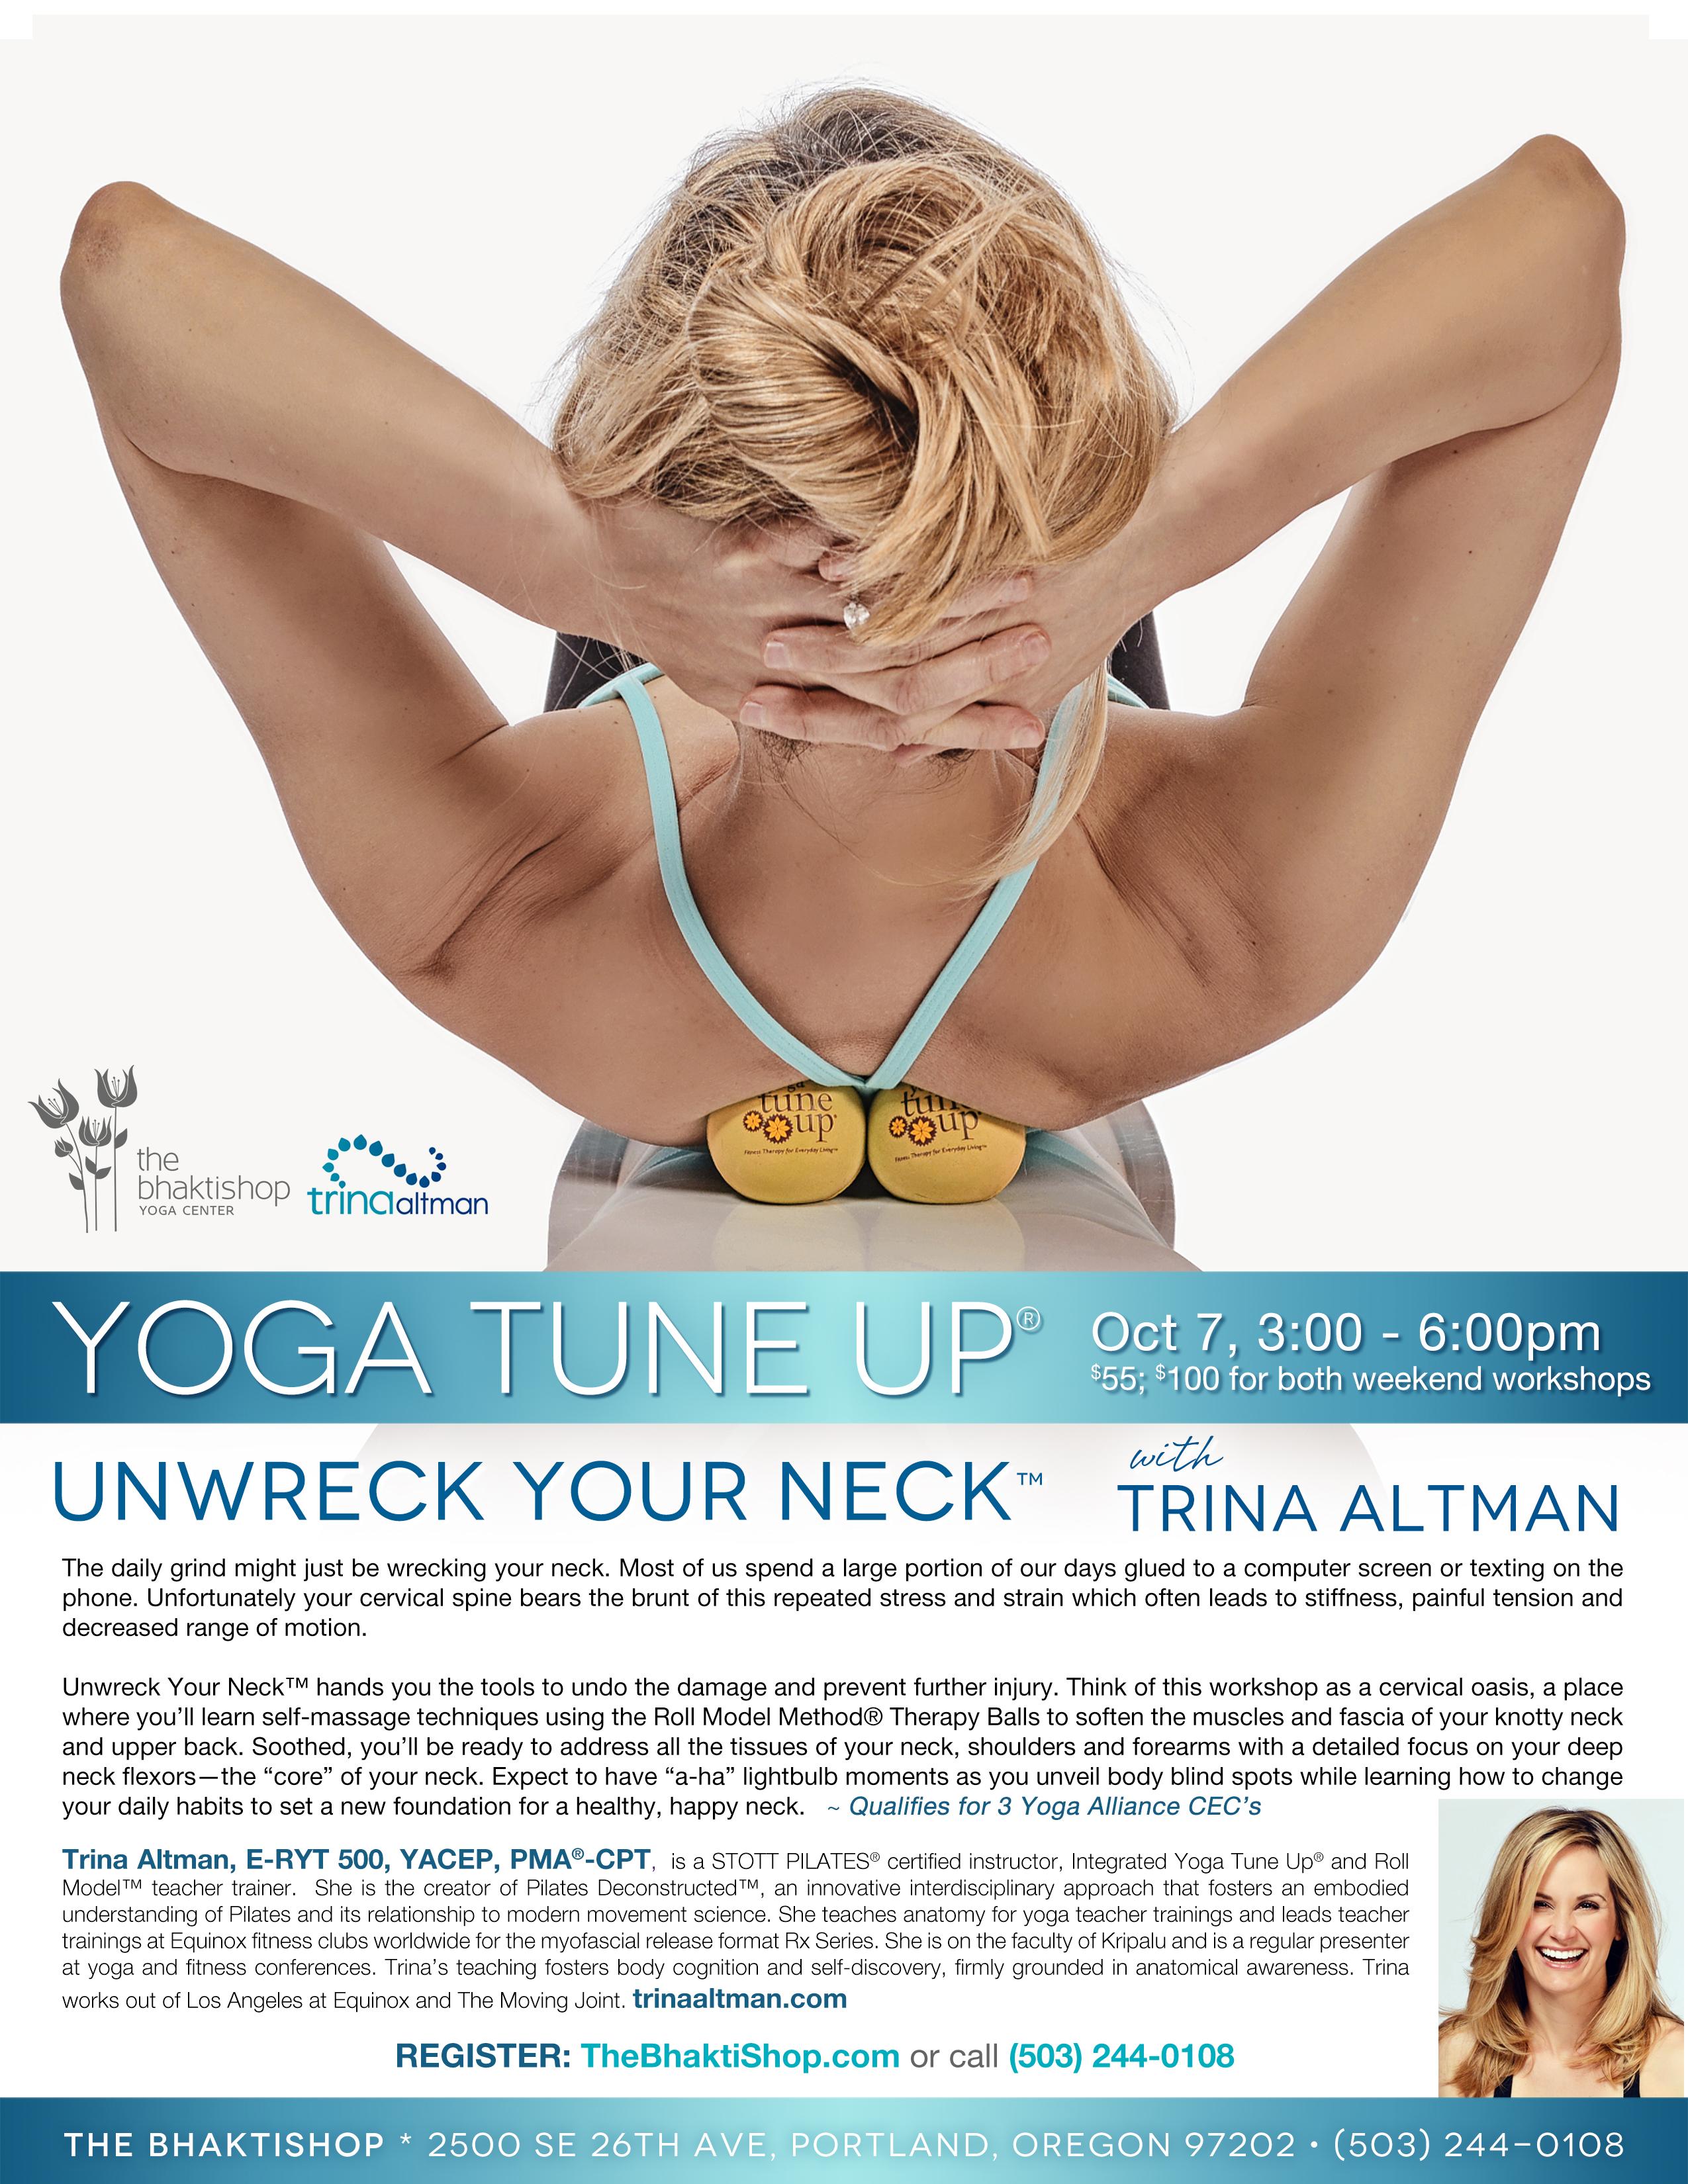 unwreck-your-neck-bhaktishop